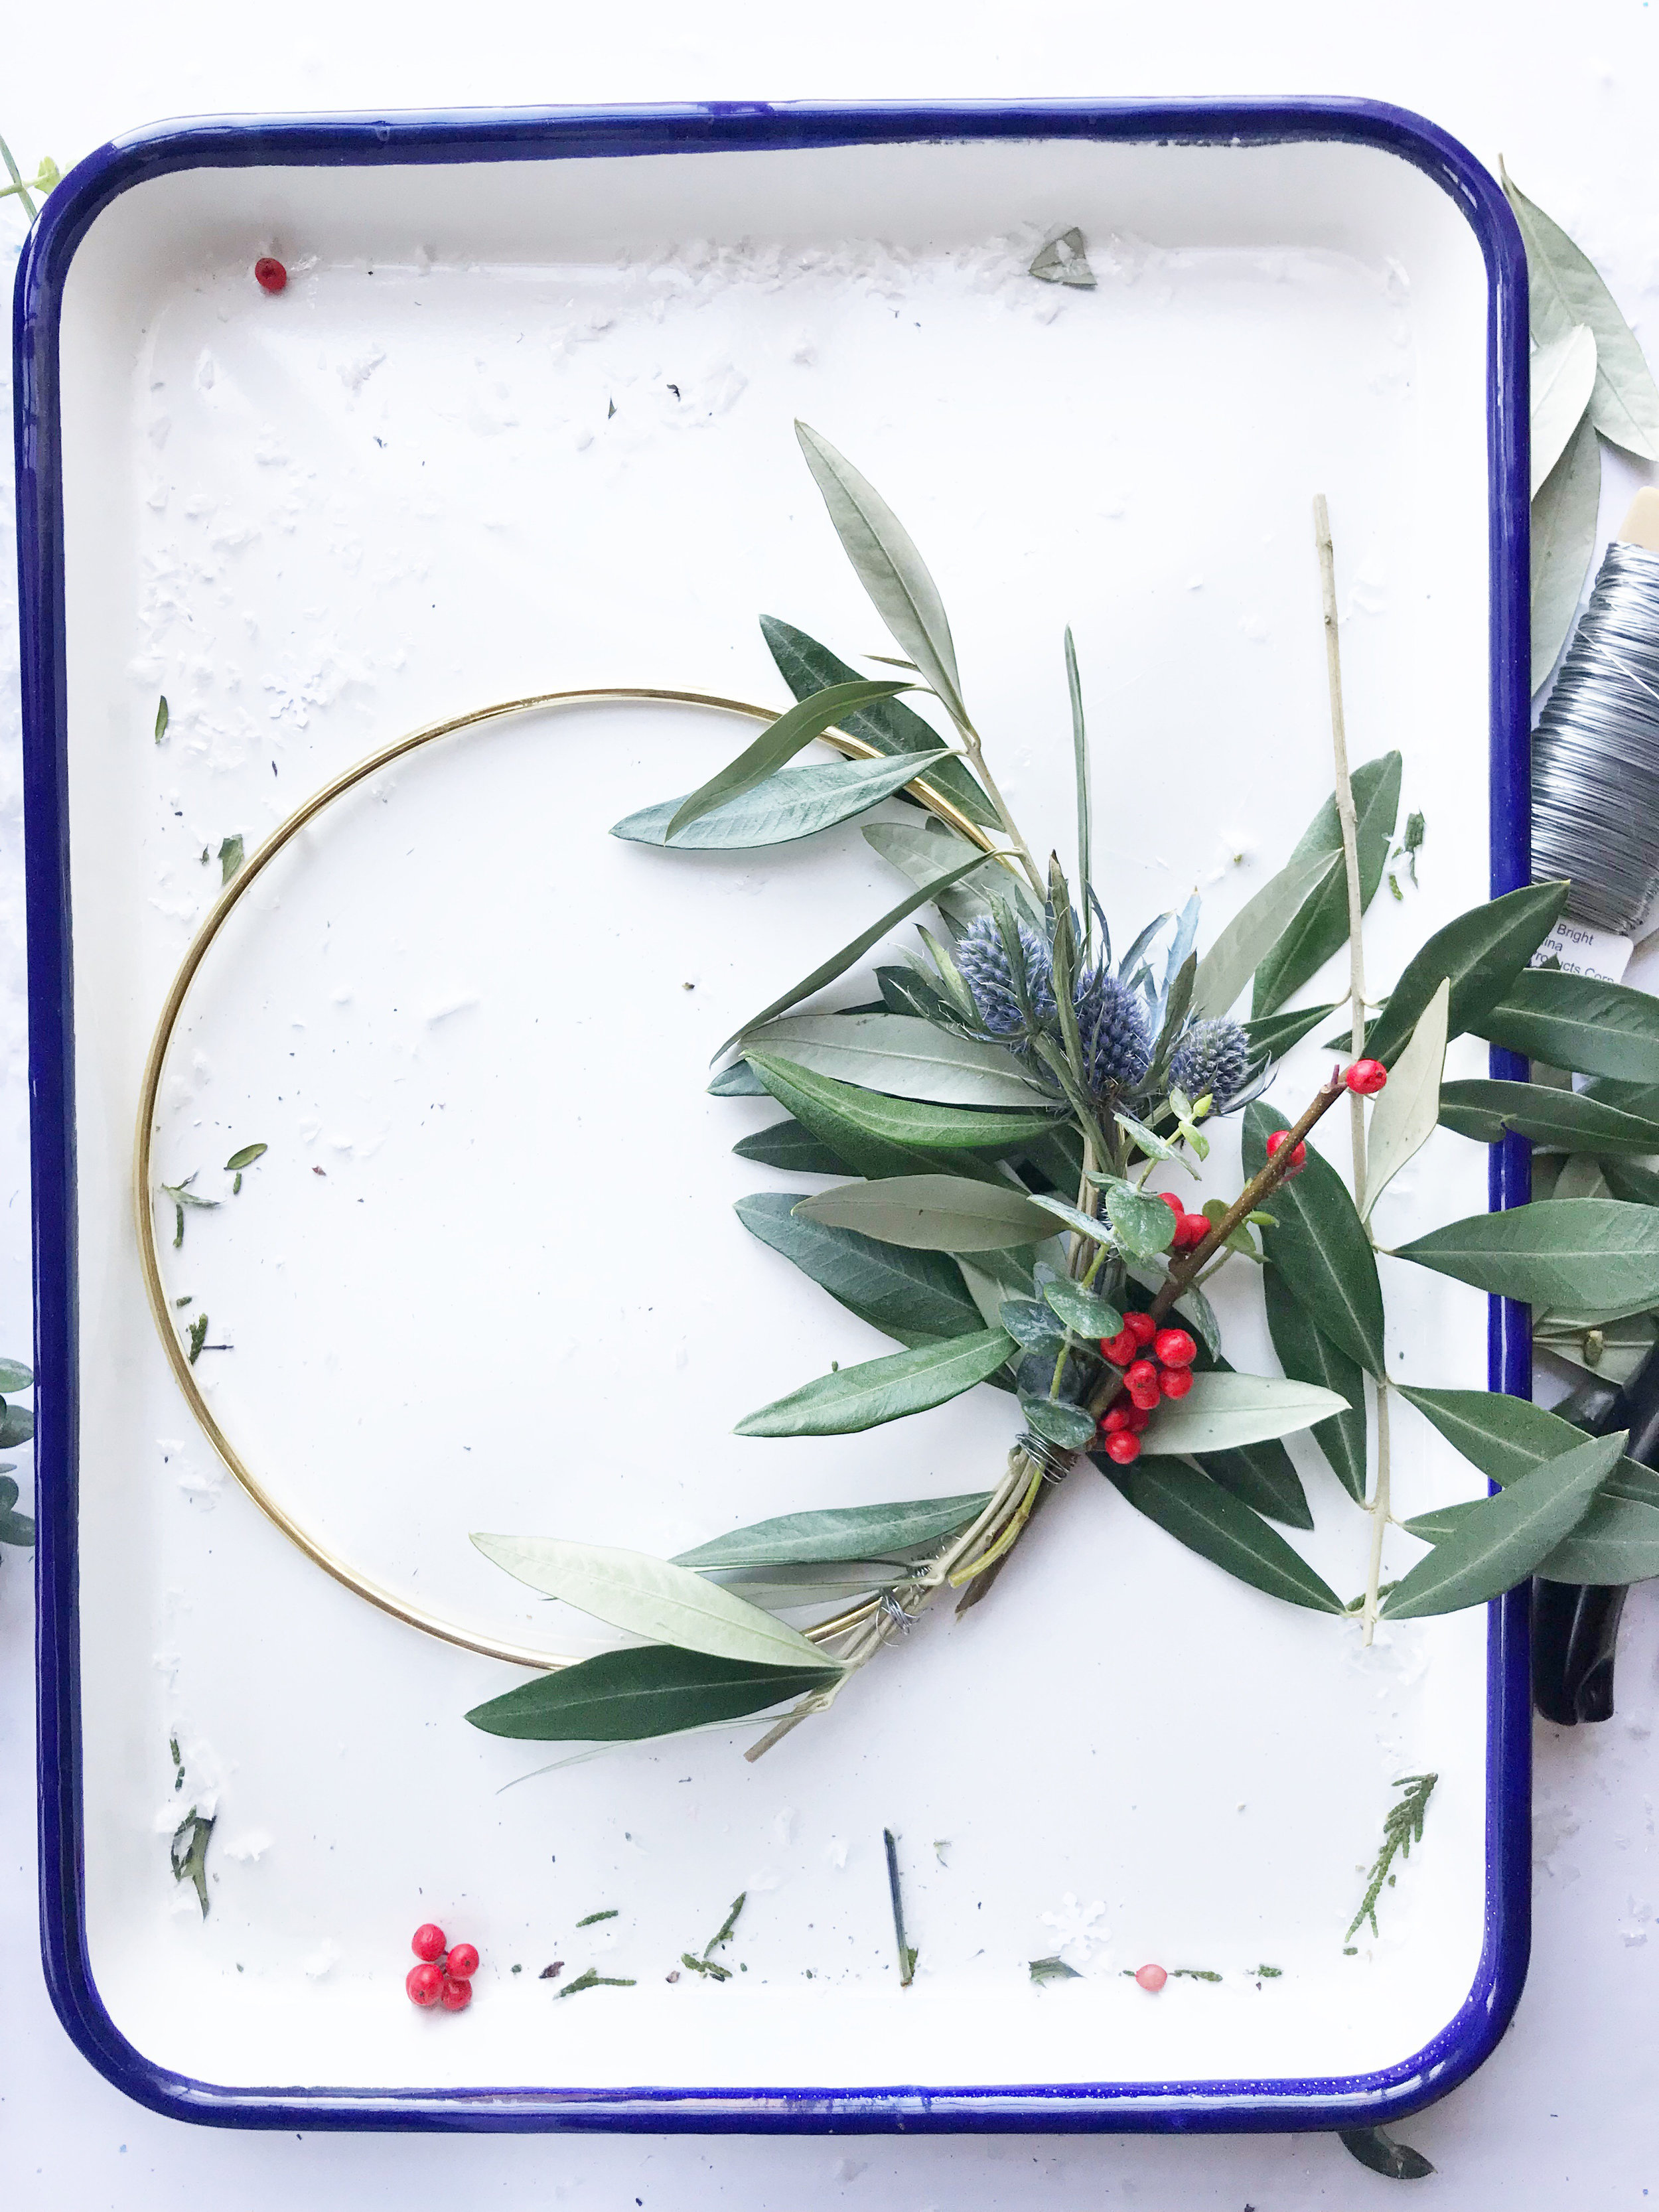 diy_holiday_wreath_13.jpg